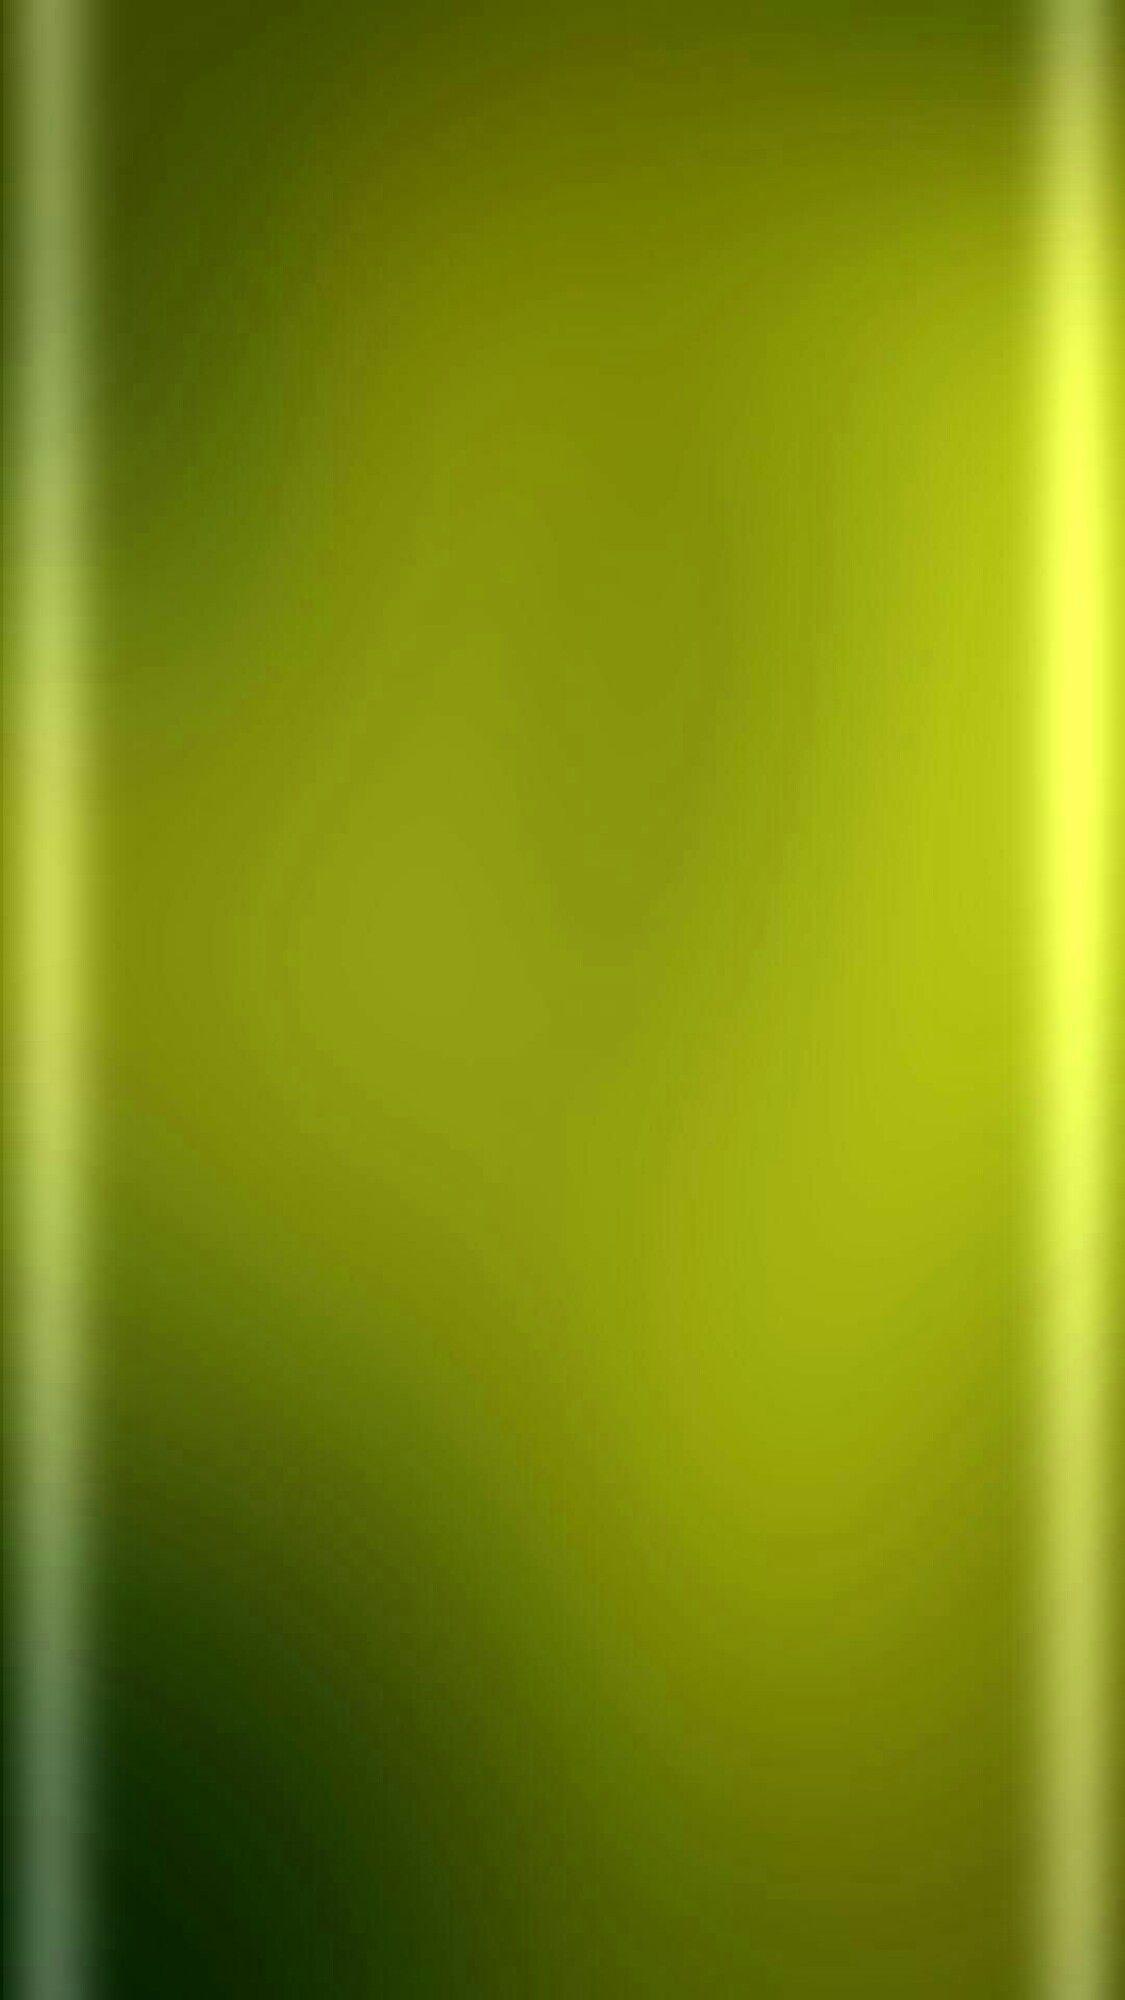 1125x2000 Wallpaper Edge Green Wallpaper Lock Screens Samsung Iphone Edge Wallpaper Download 1125x2000 Download Hd Wallpaper Wallpapertip